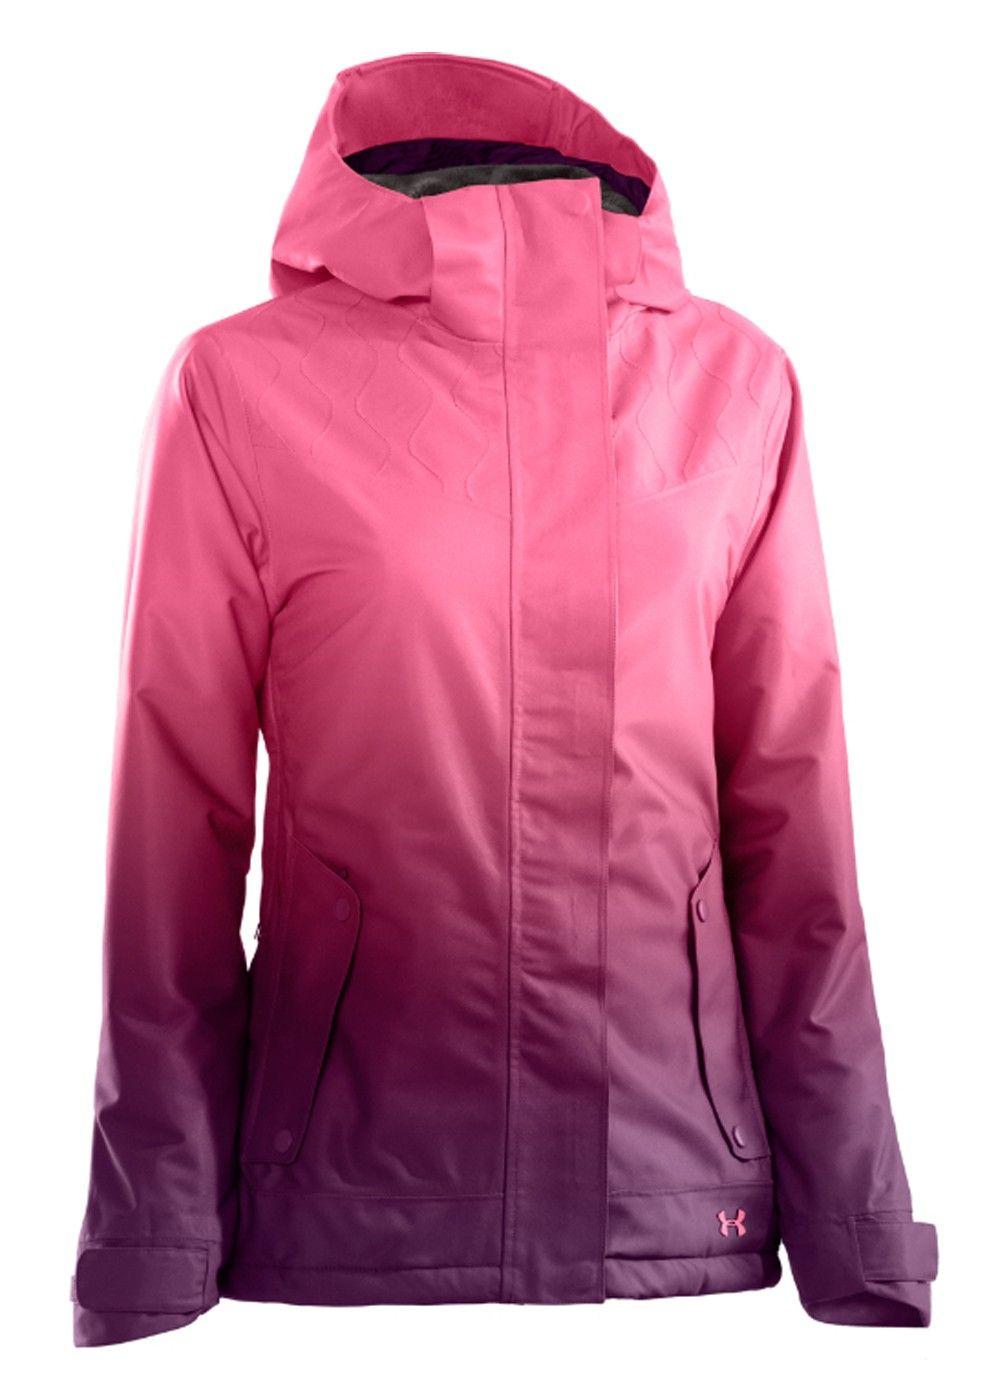 under armour jacket women women